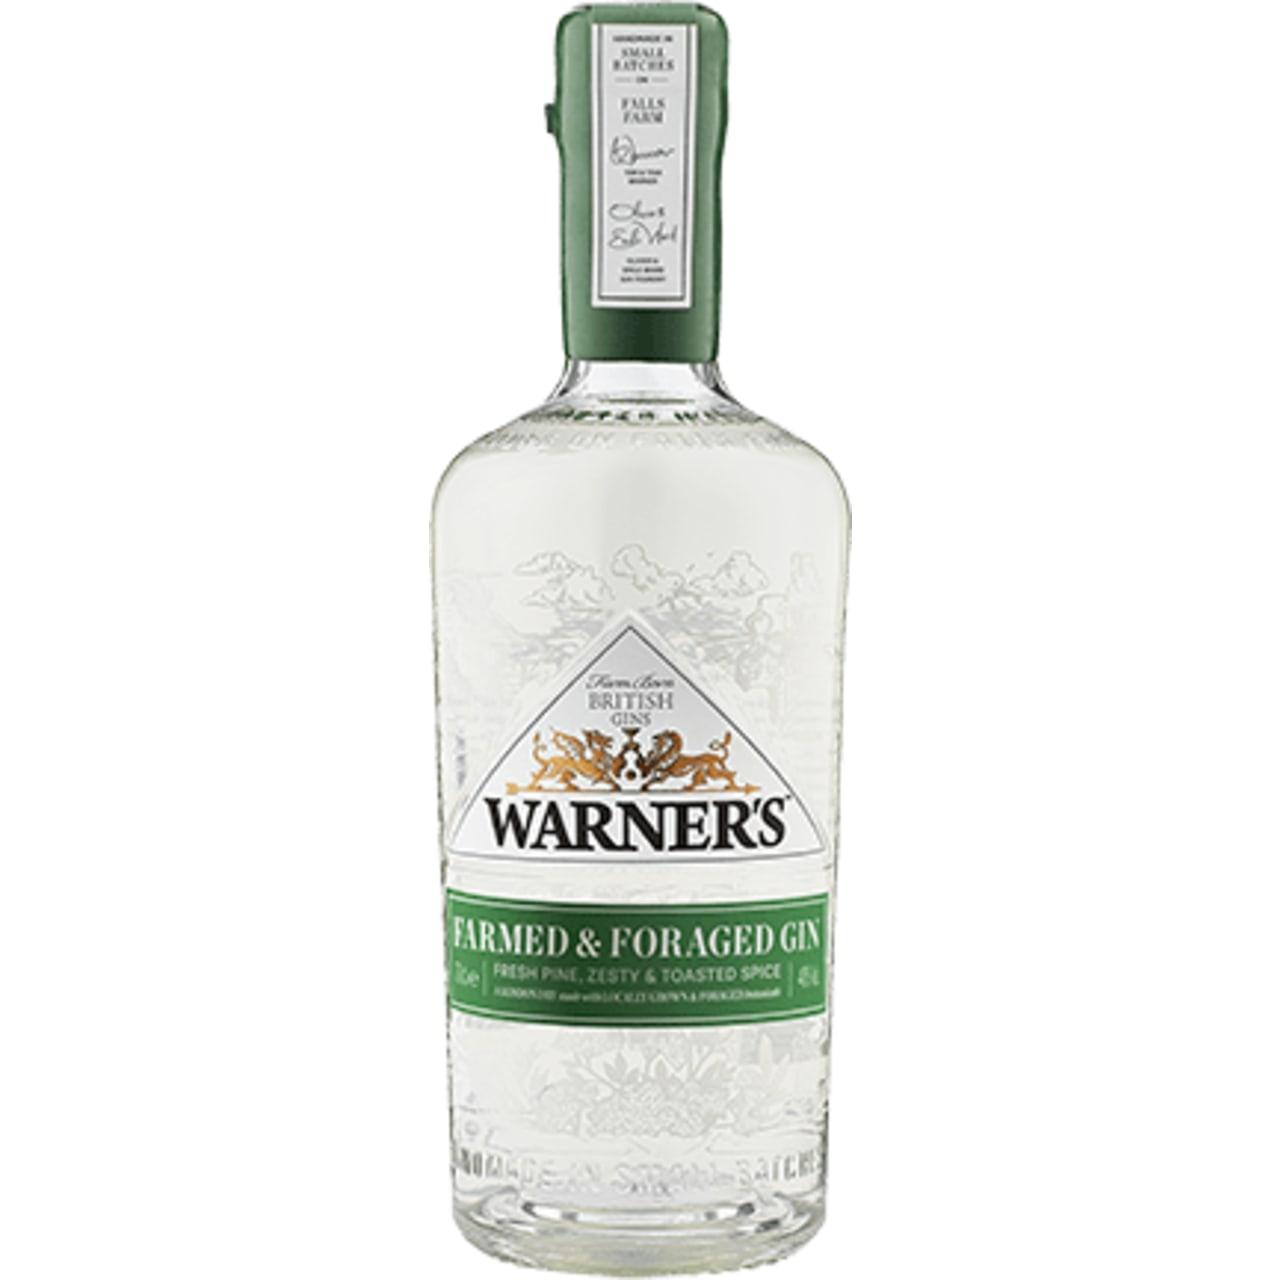 Warner's Farmed & Foraged Gin